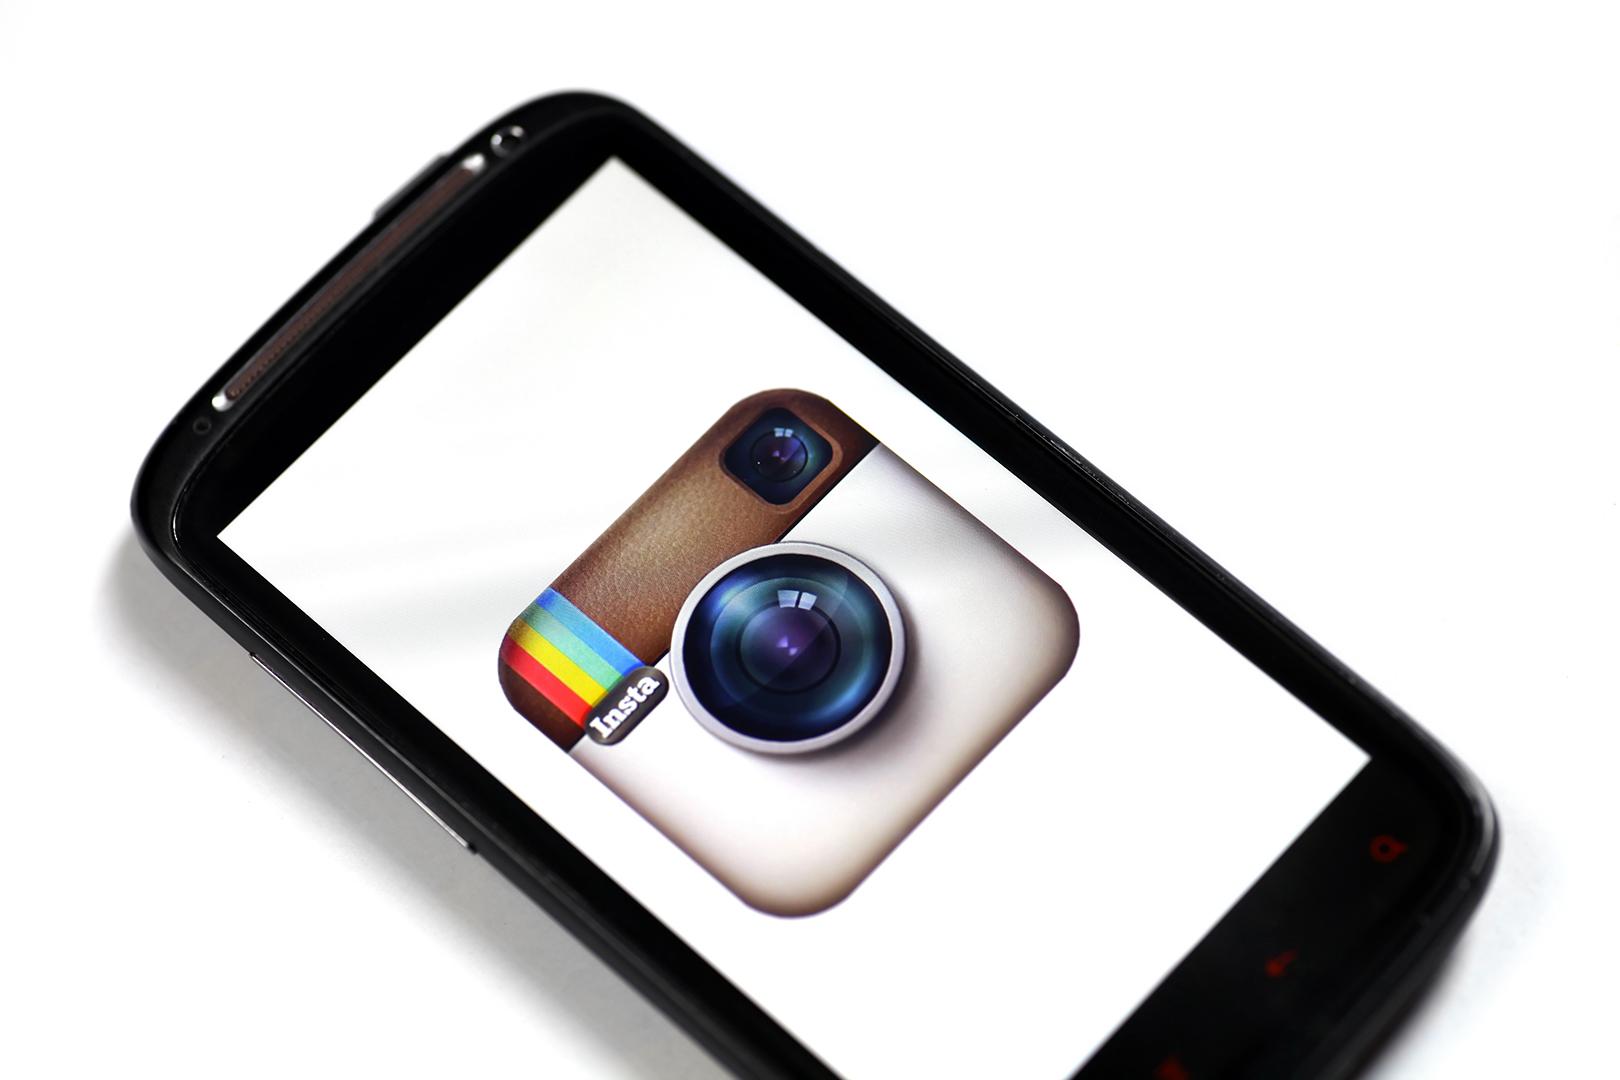 Diagonal marketingagentur.ch Instagram